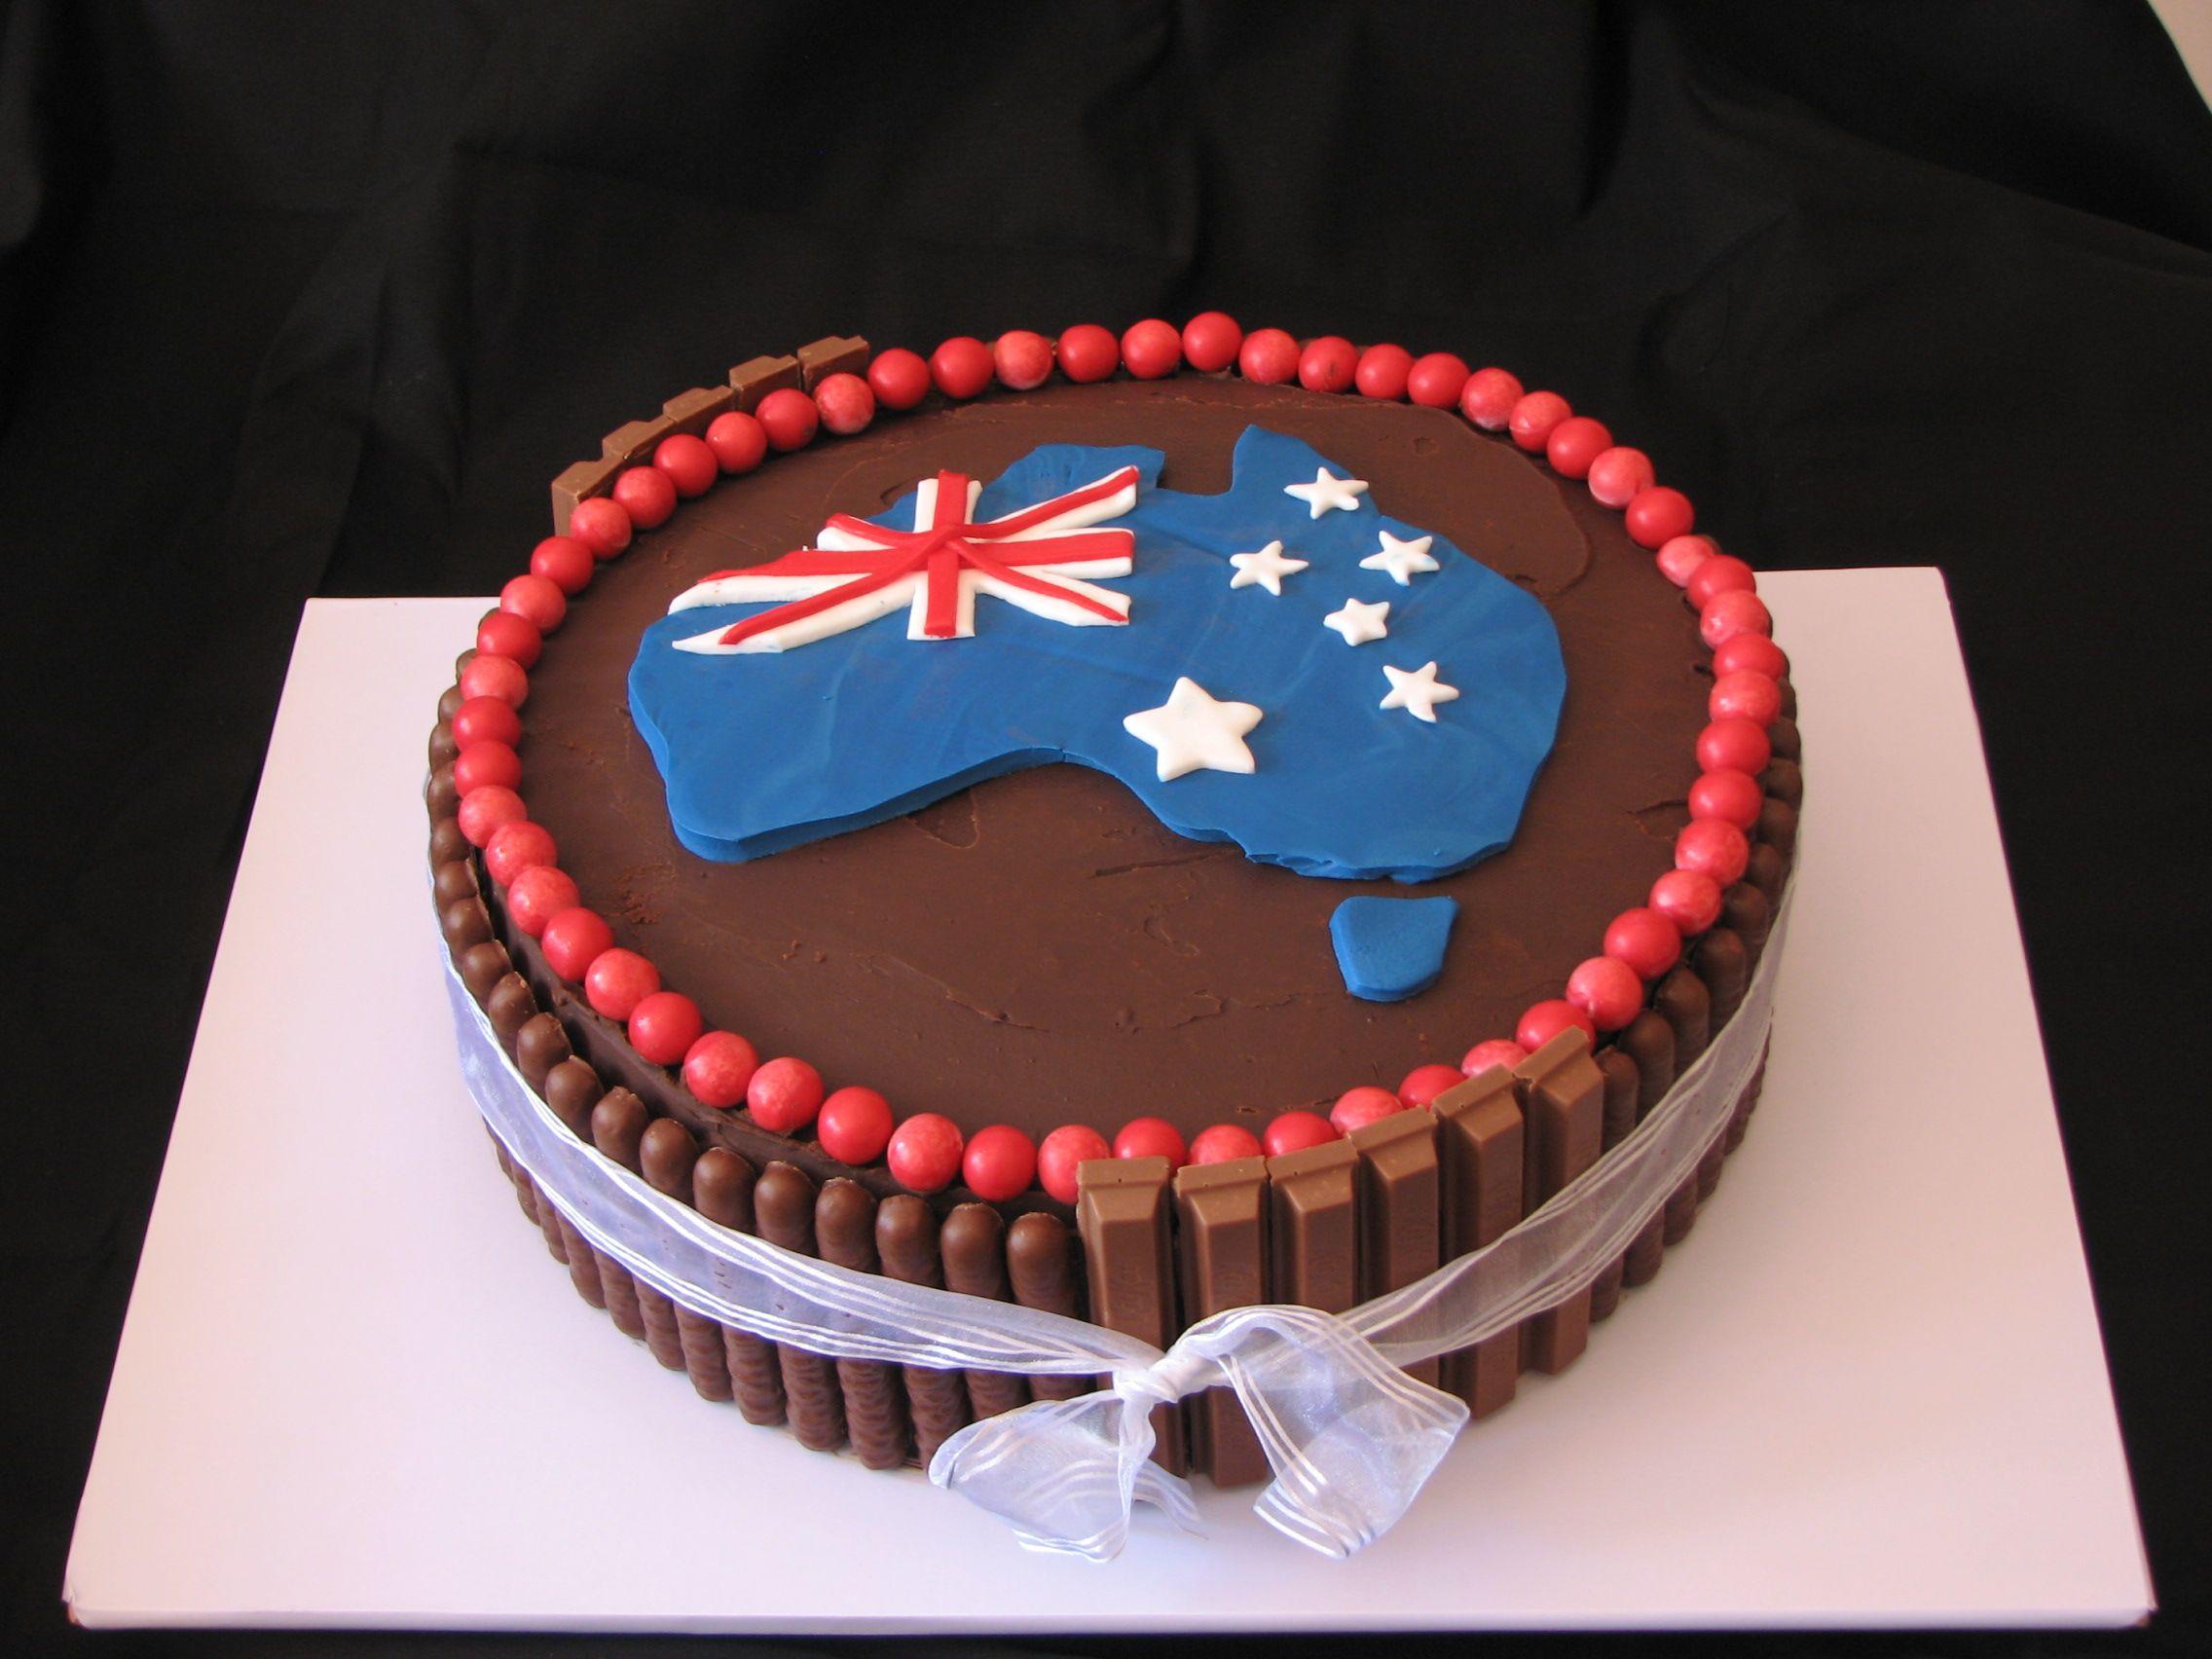 Australia day cake australia day is jan 26